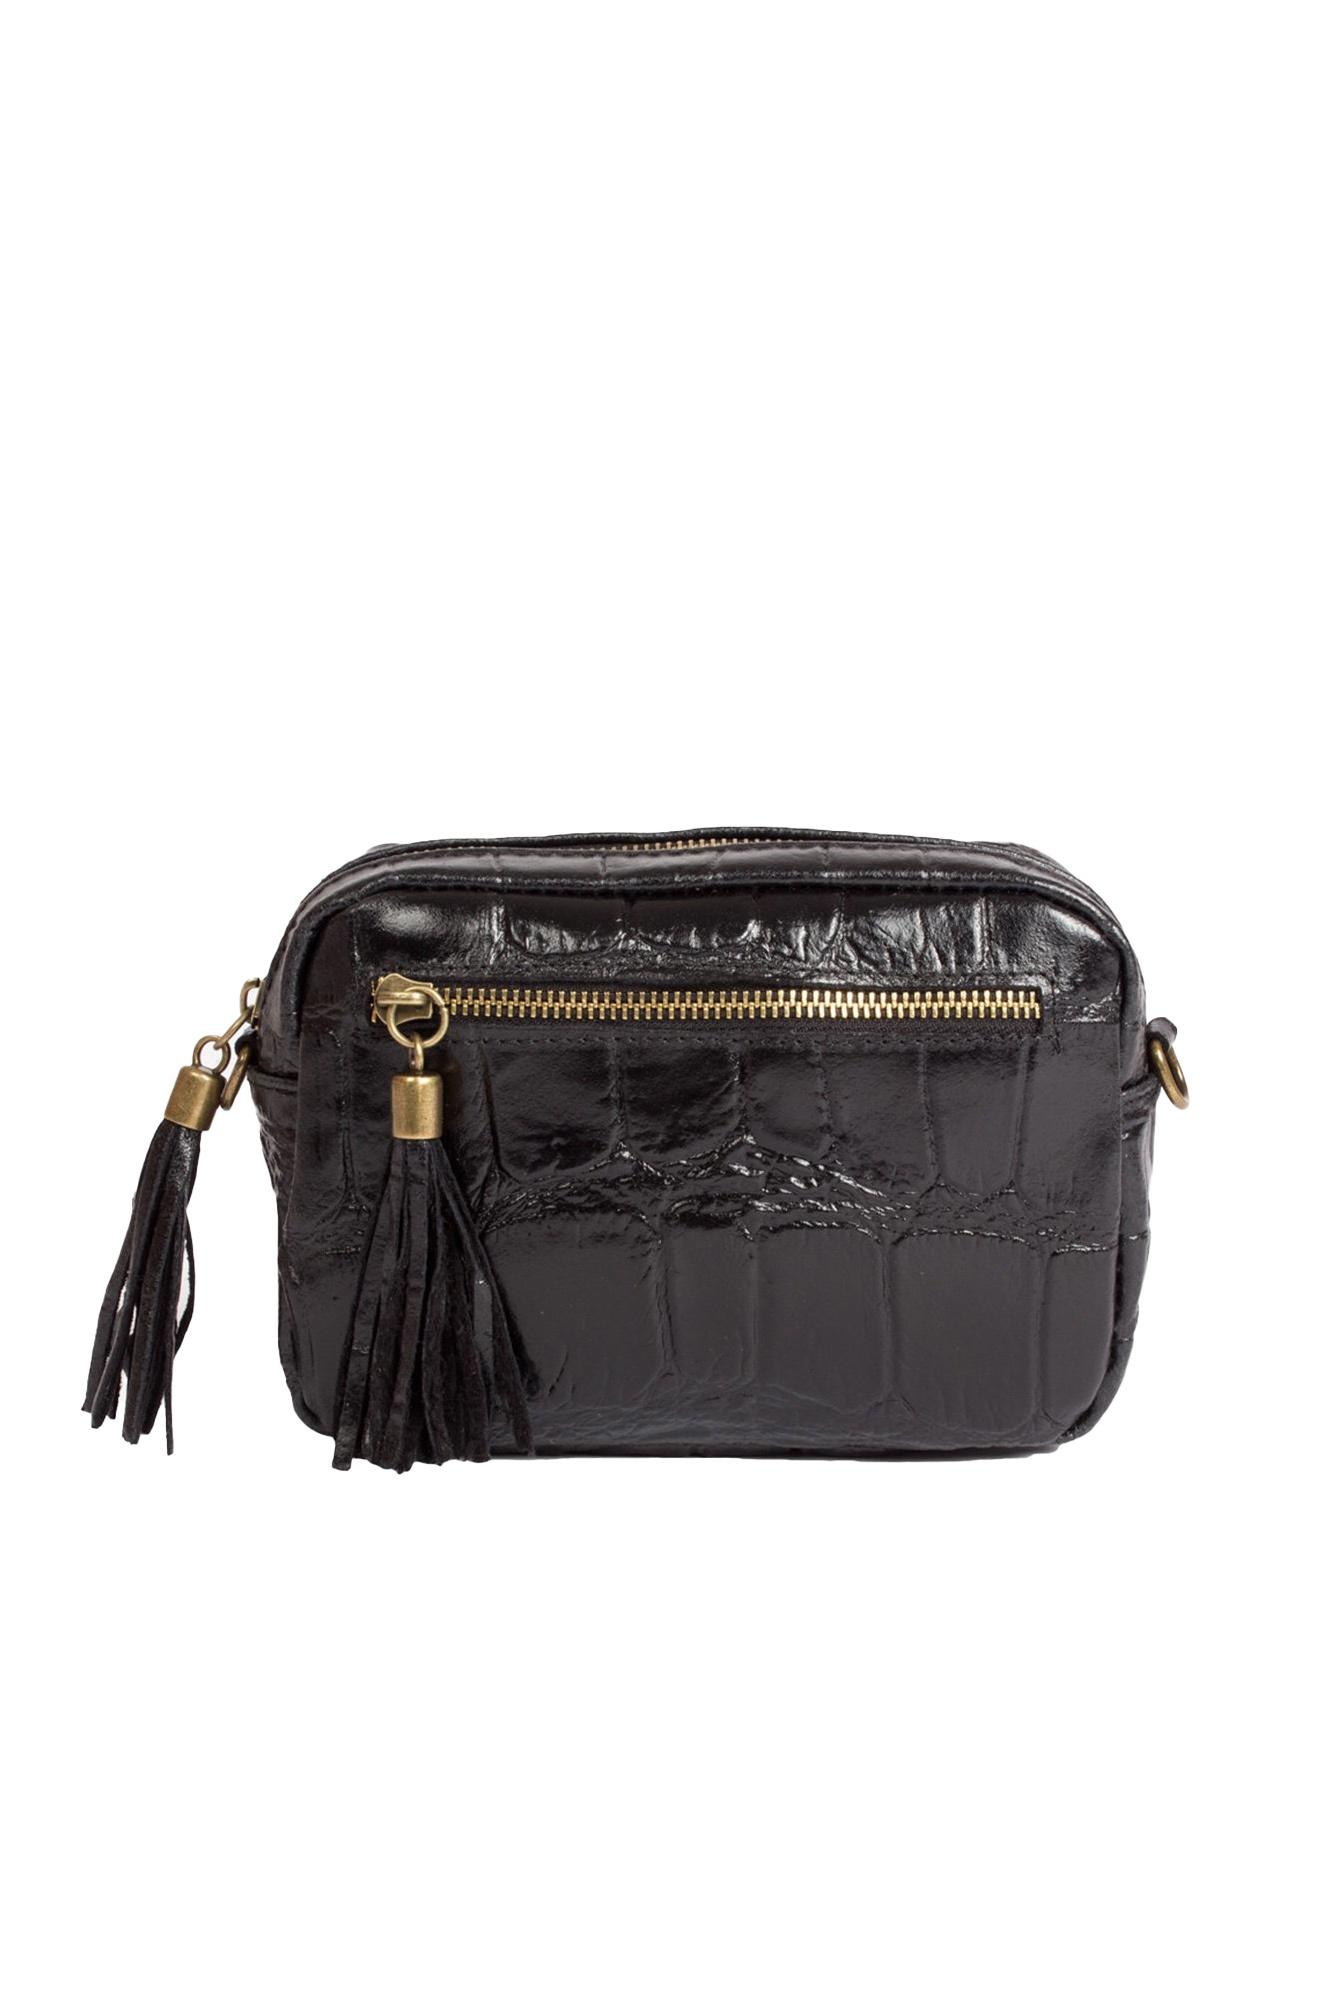 Croco leather bag black